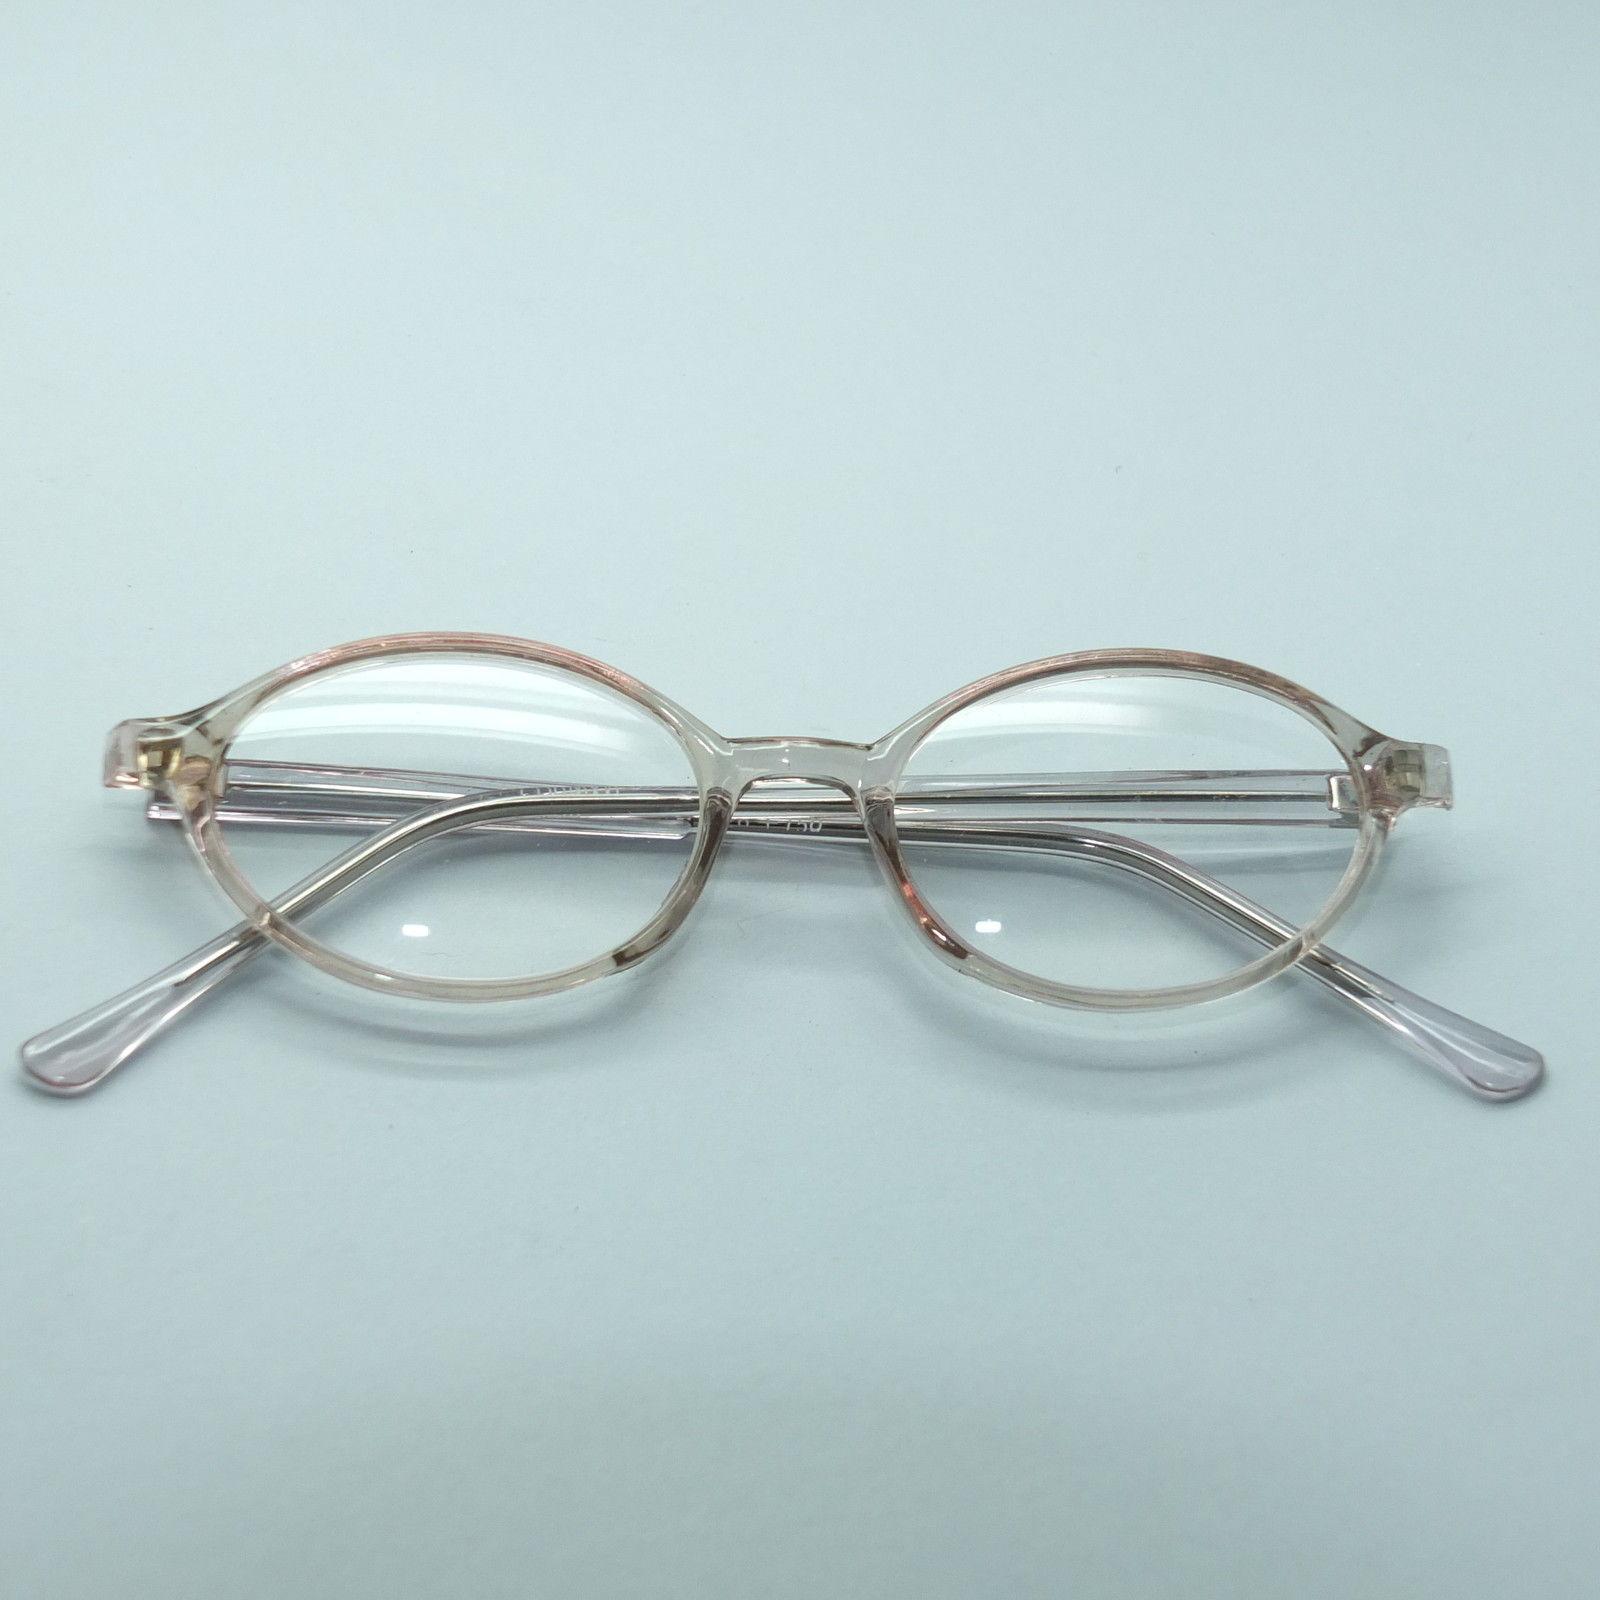 pale lavender classic low profile reading glasses 1 50